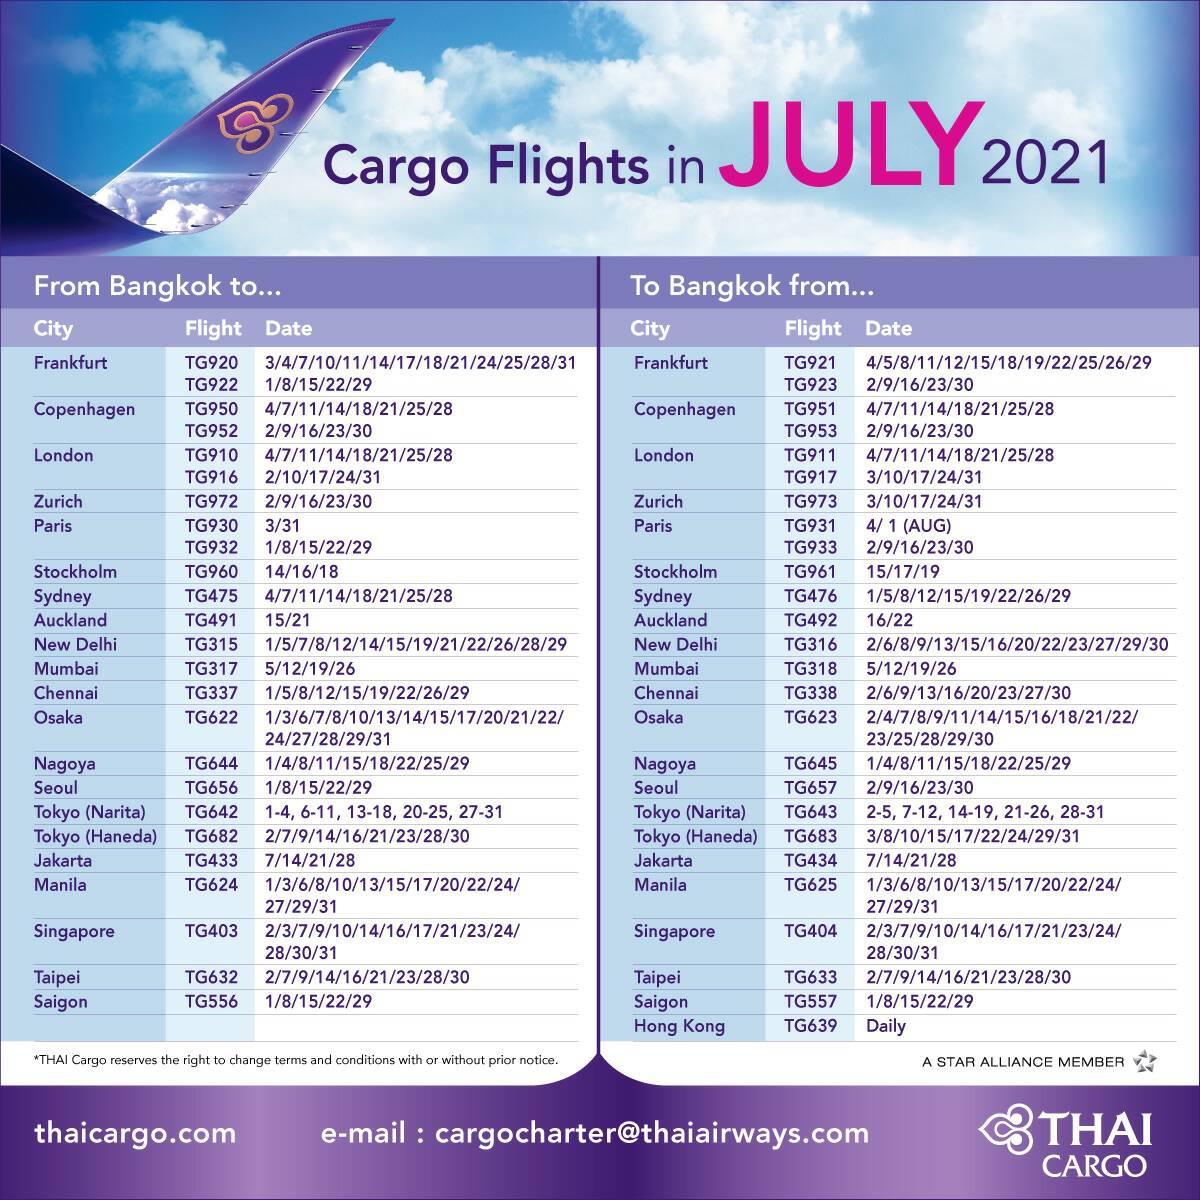 THAI ready to deliver cargo to 22 destinations in Asia, Europe, Australia